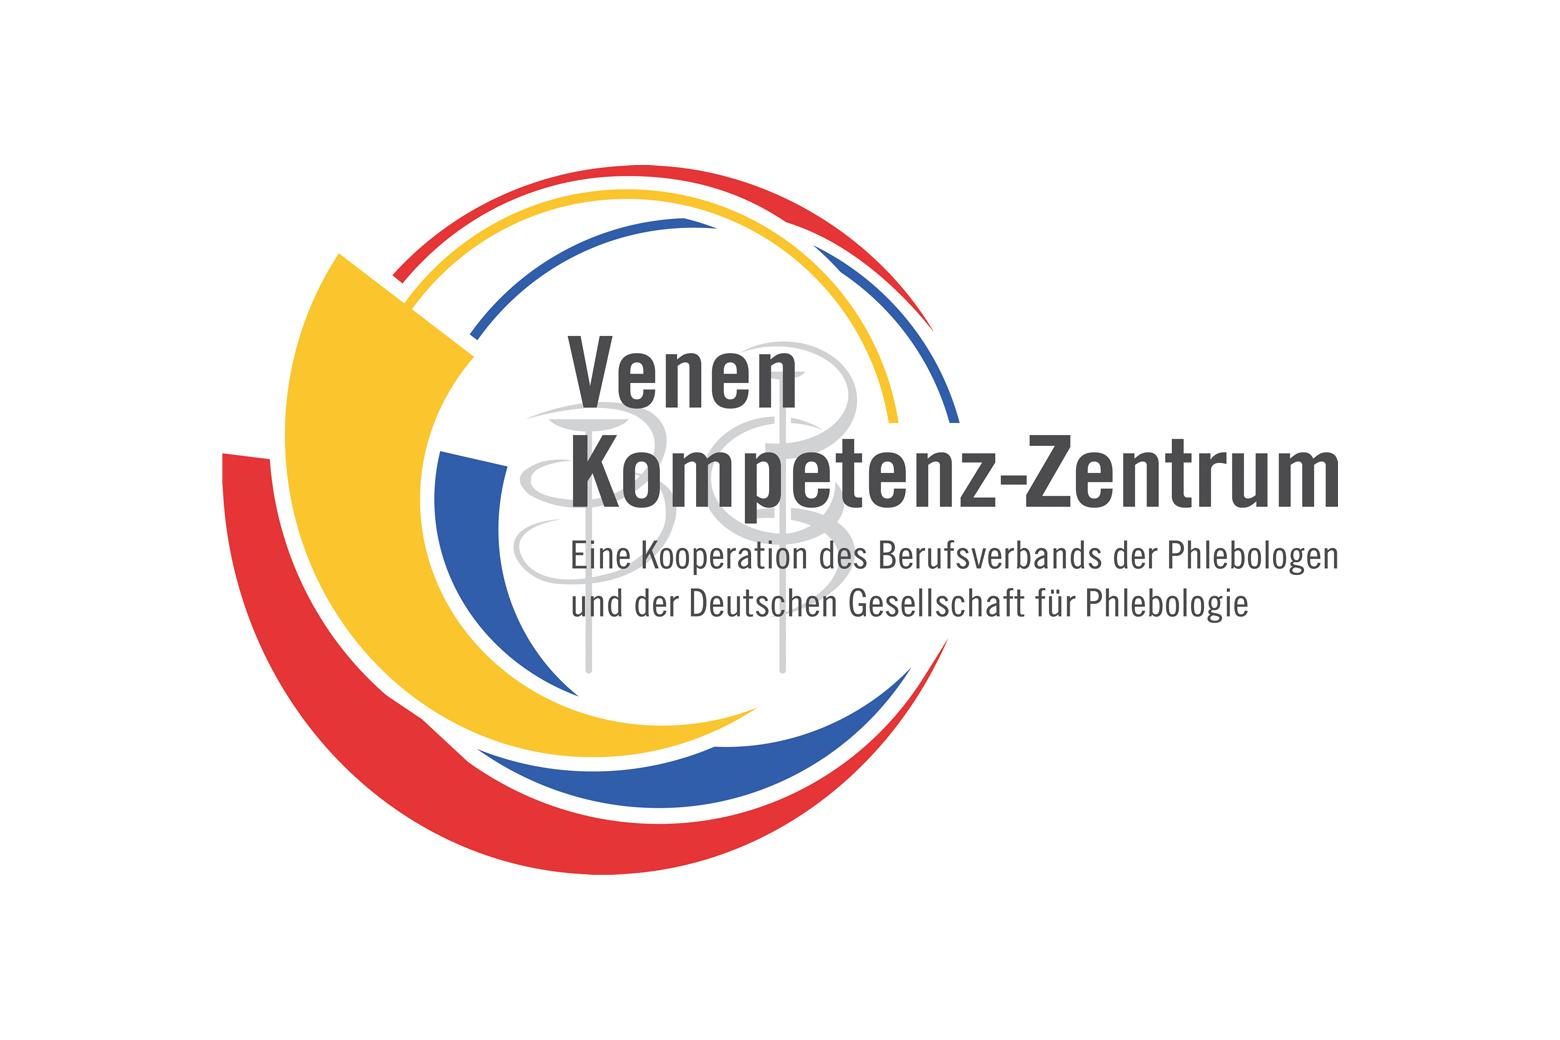 Zertifiziert als <br>Venen Kompetenz-Zentrum